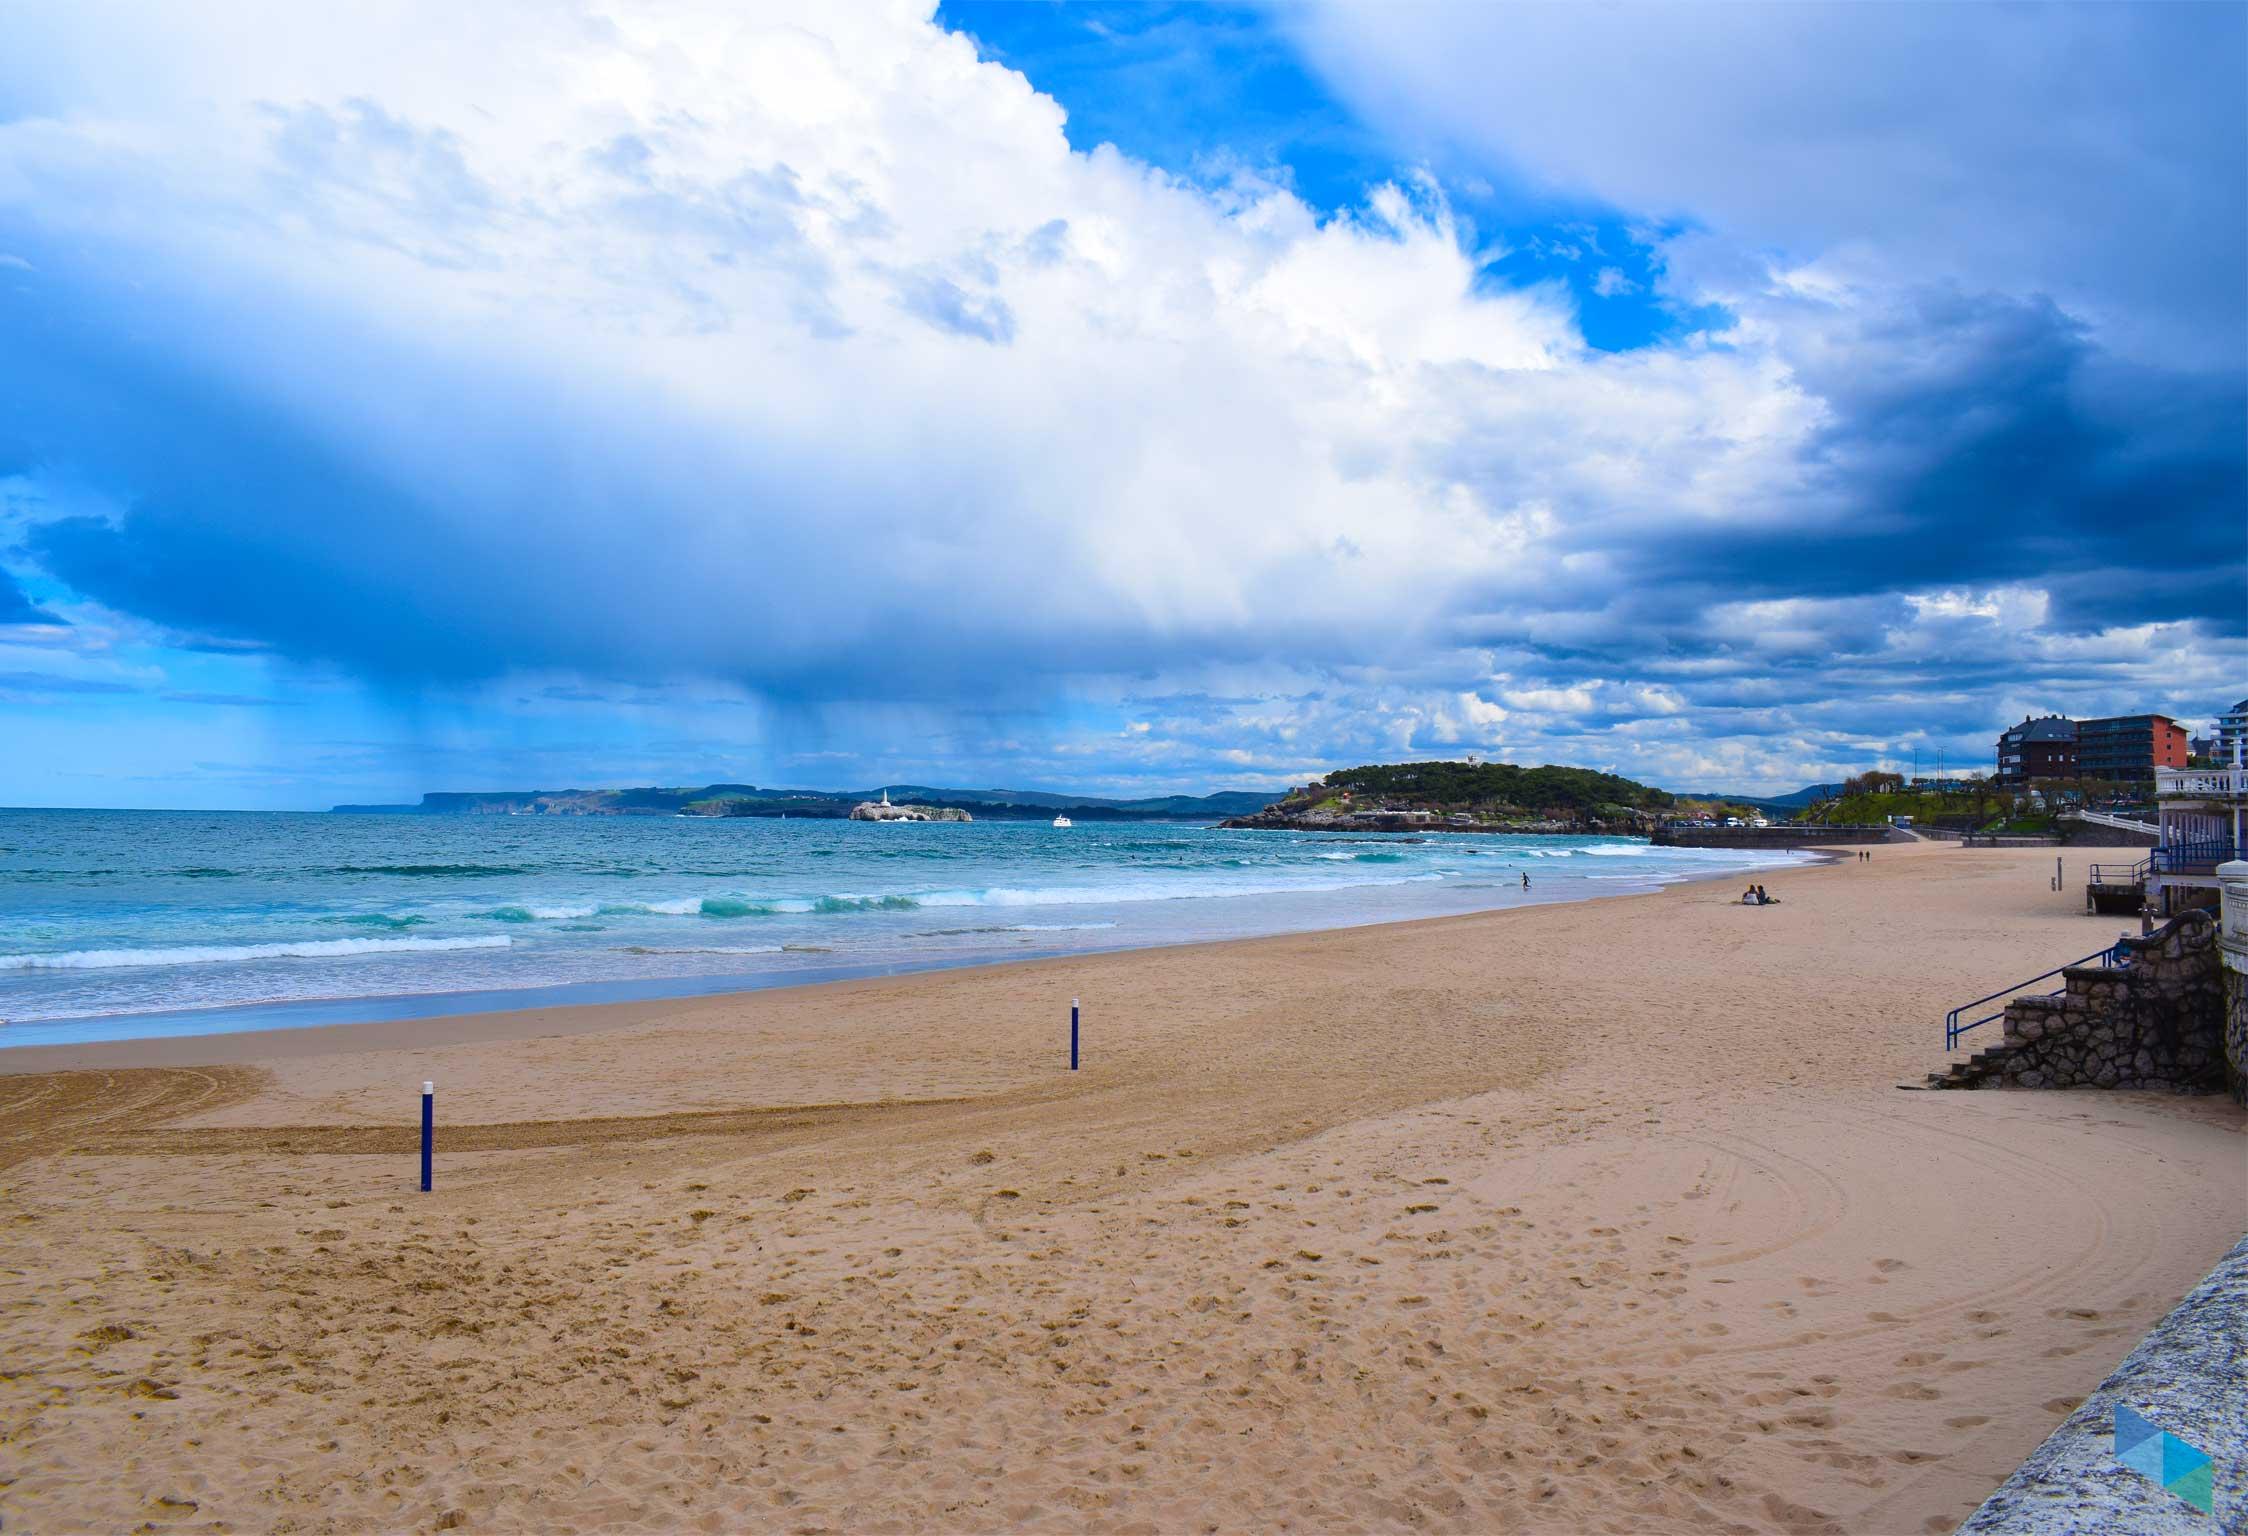 Primera Playa del Sardinero fuertes lluvias